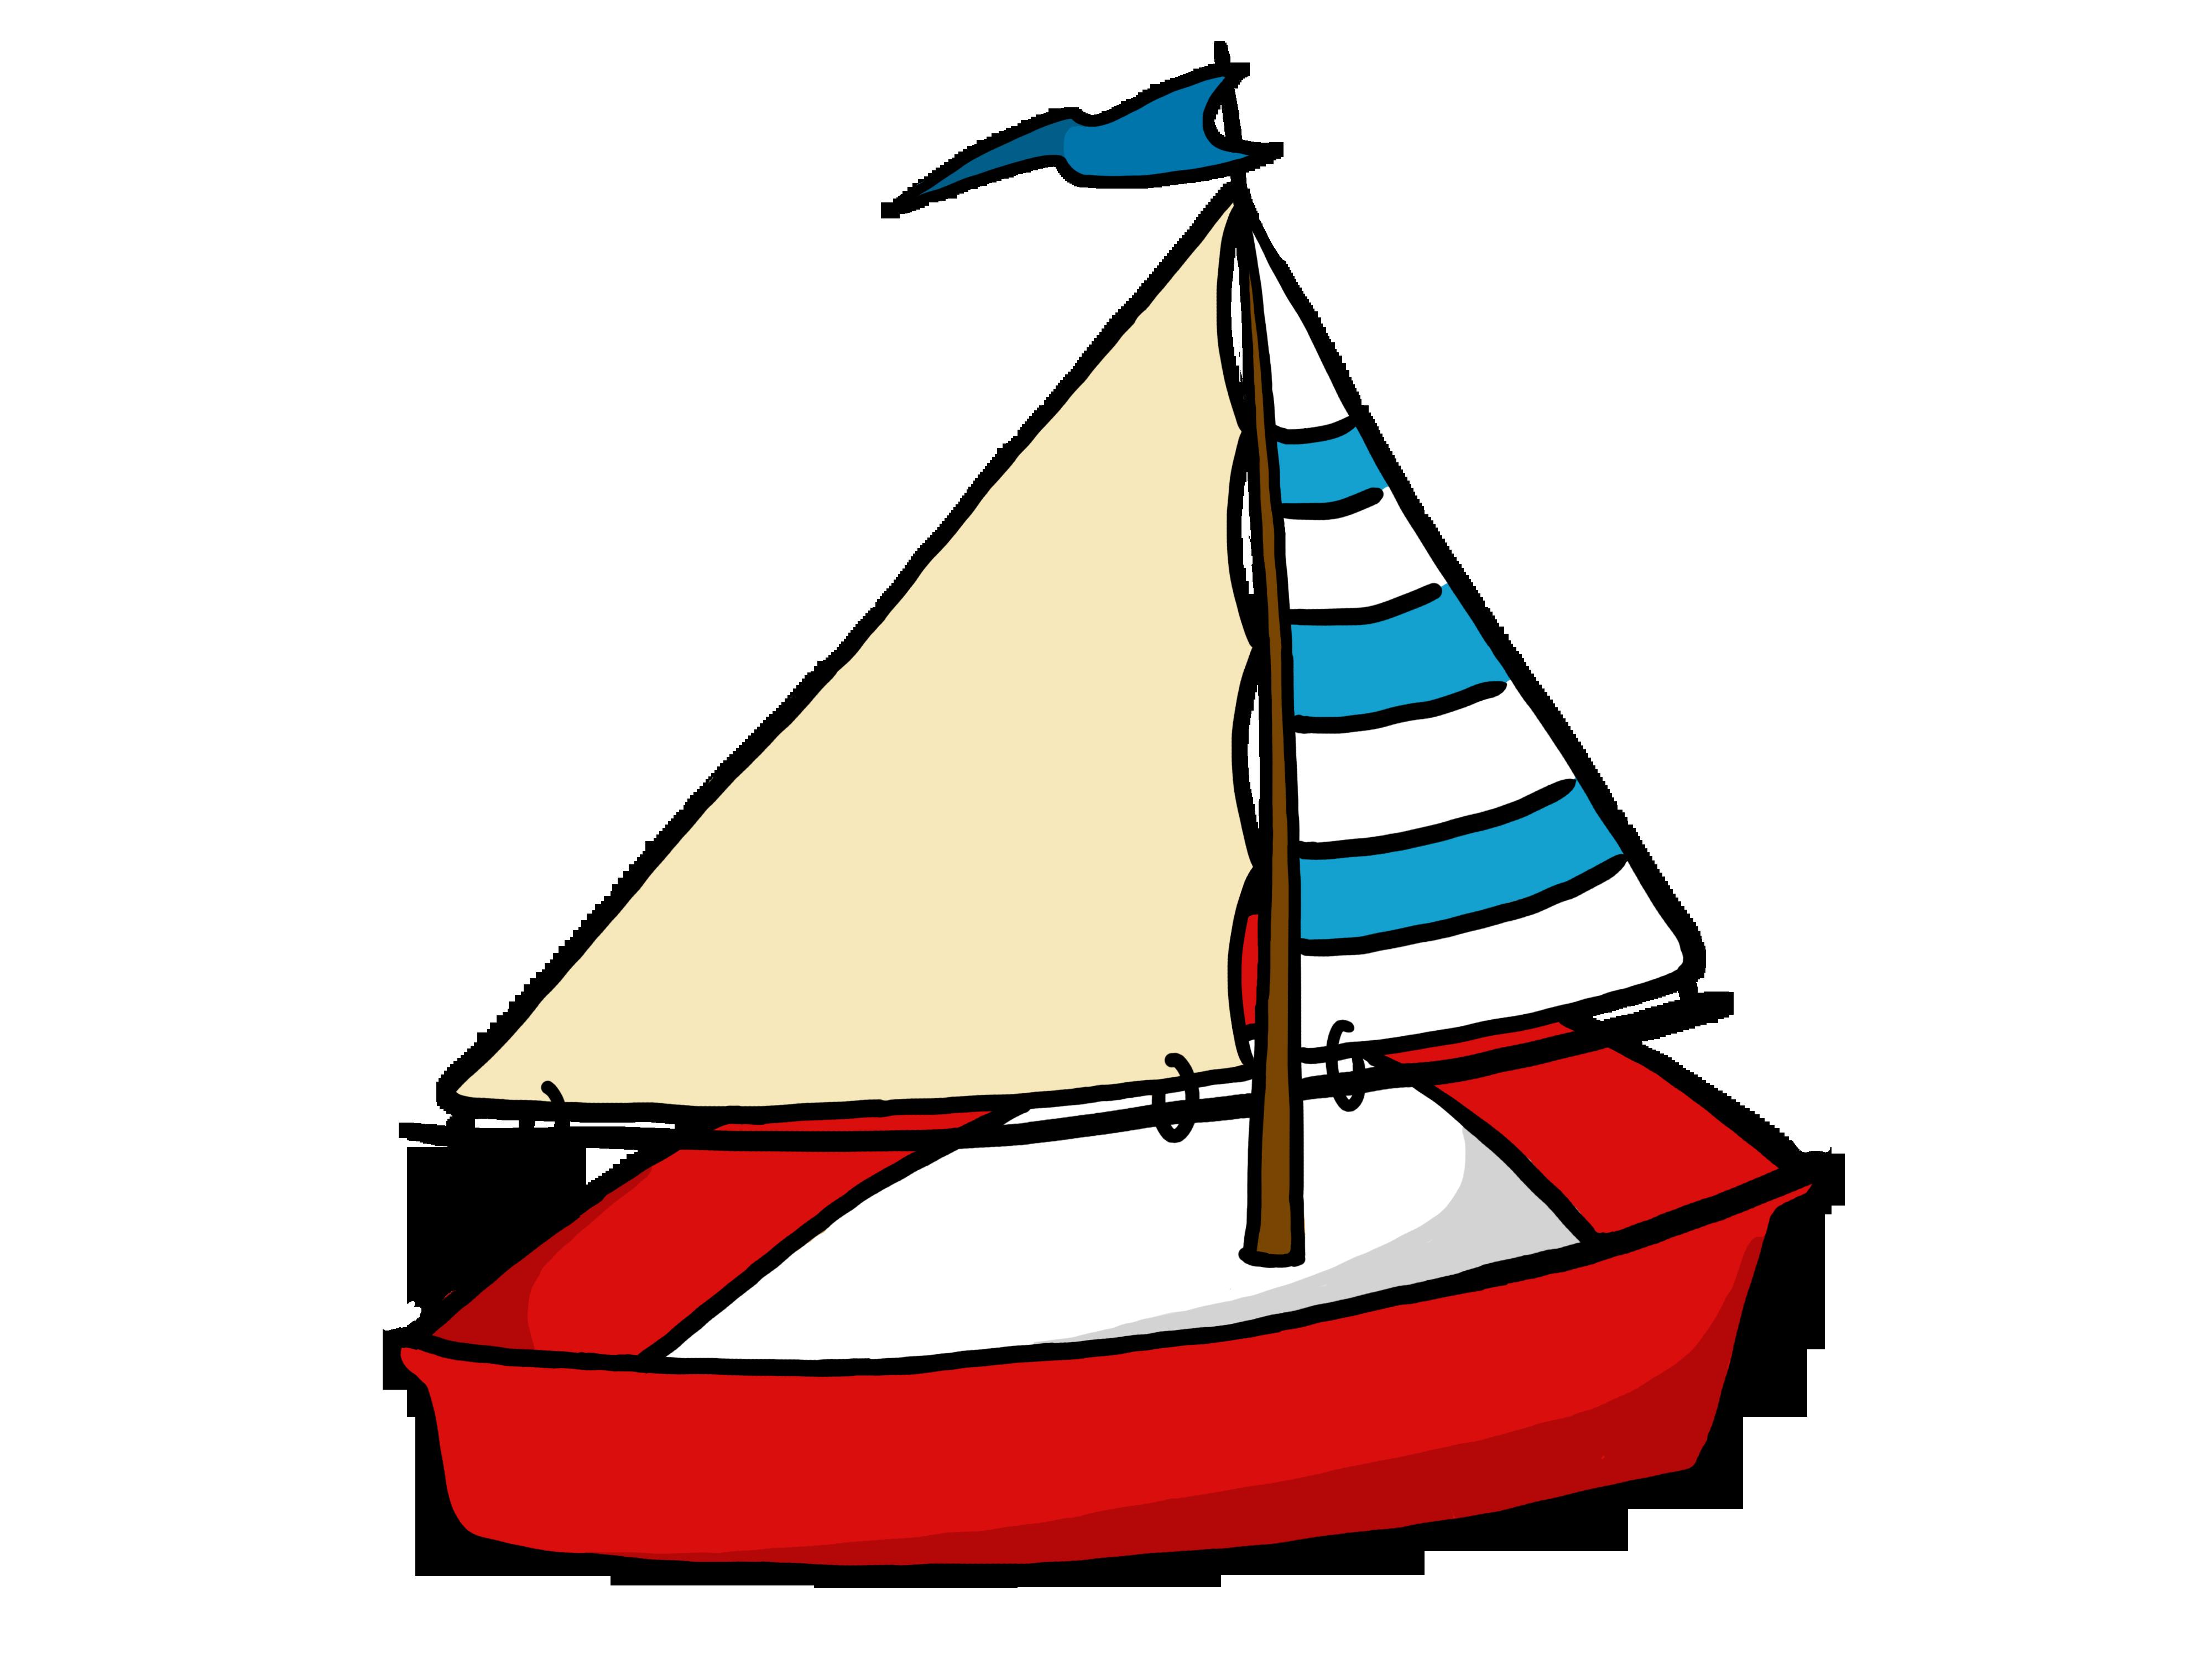 4000x3000 Boating Clipart Clipart Panda